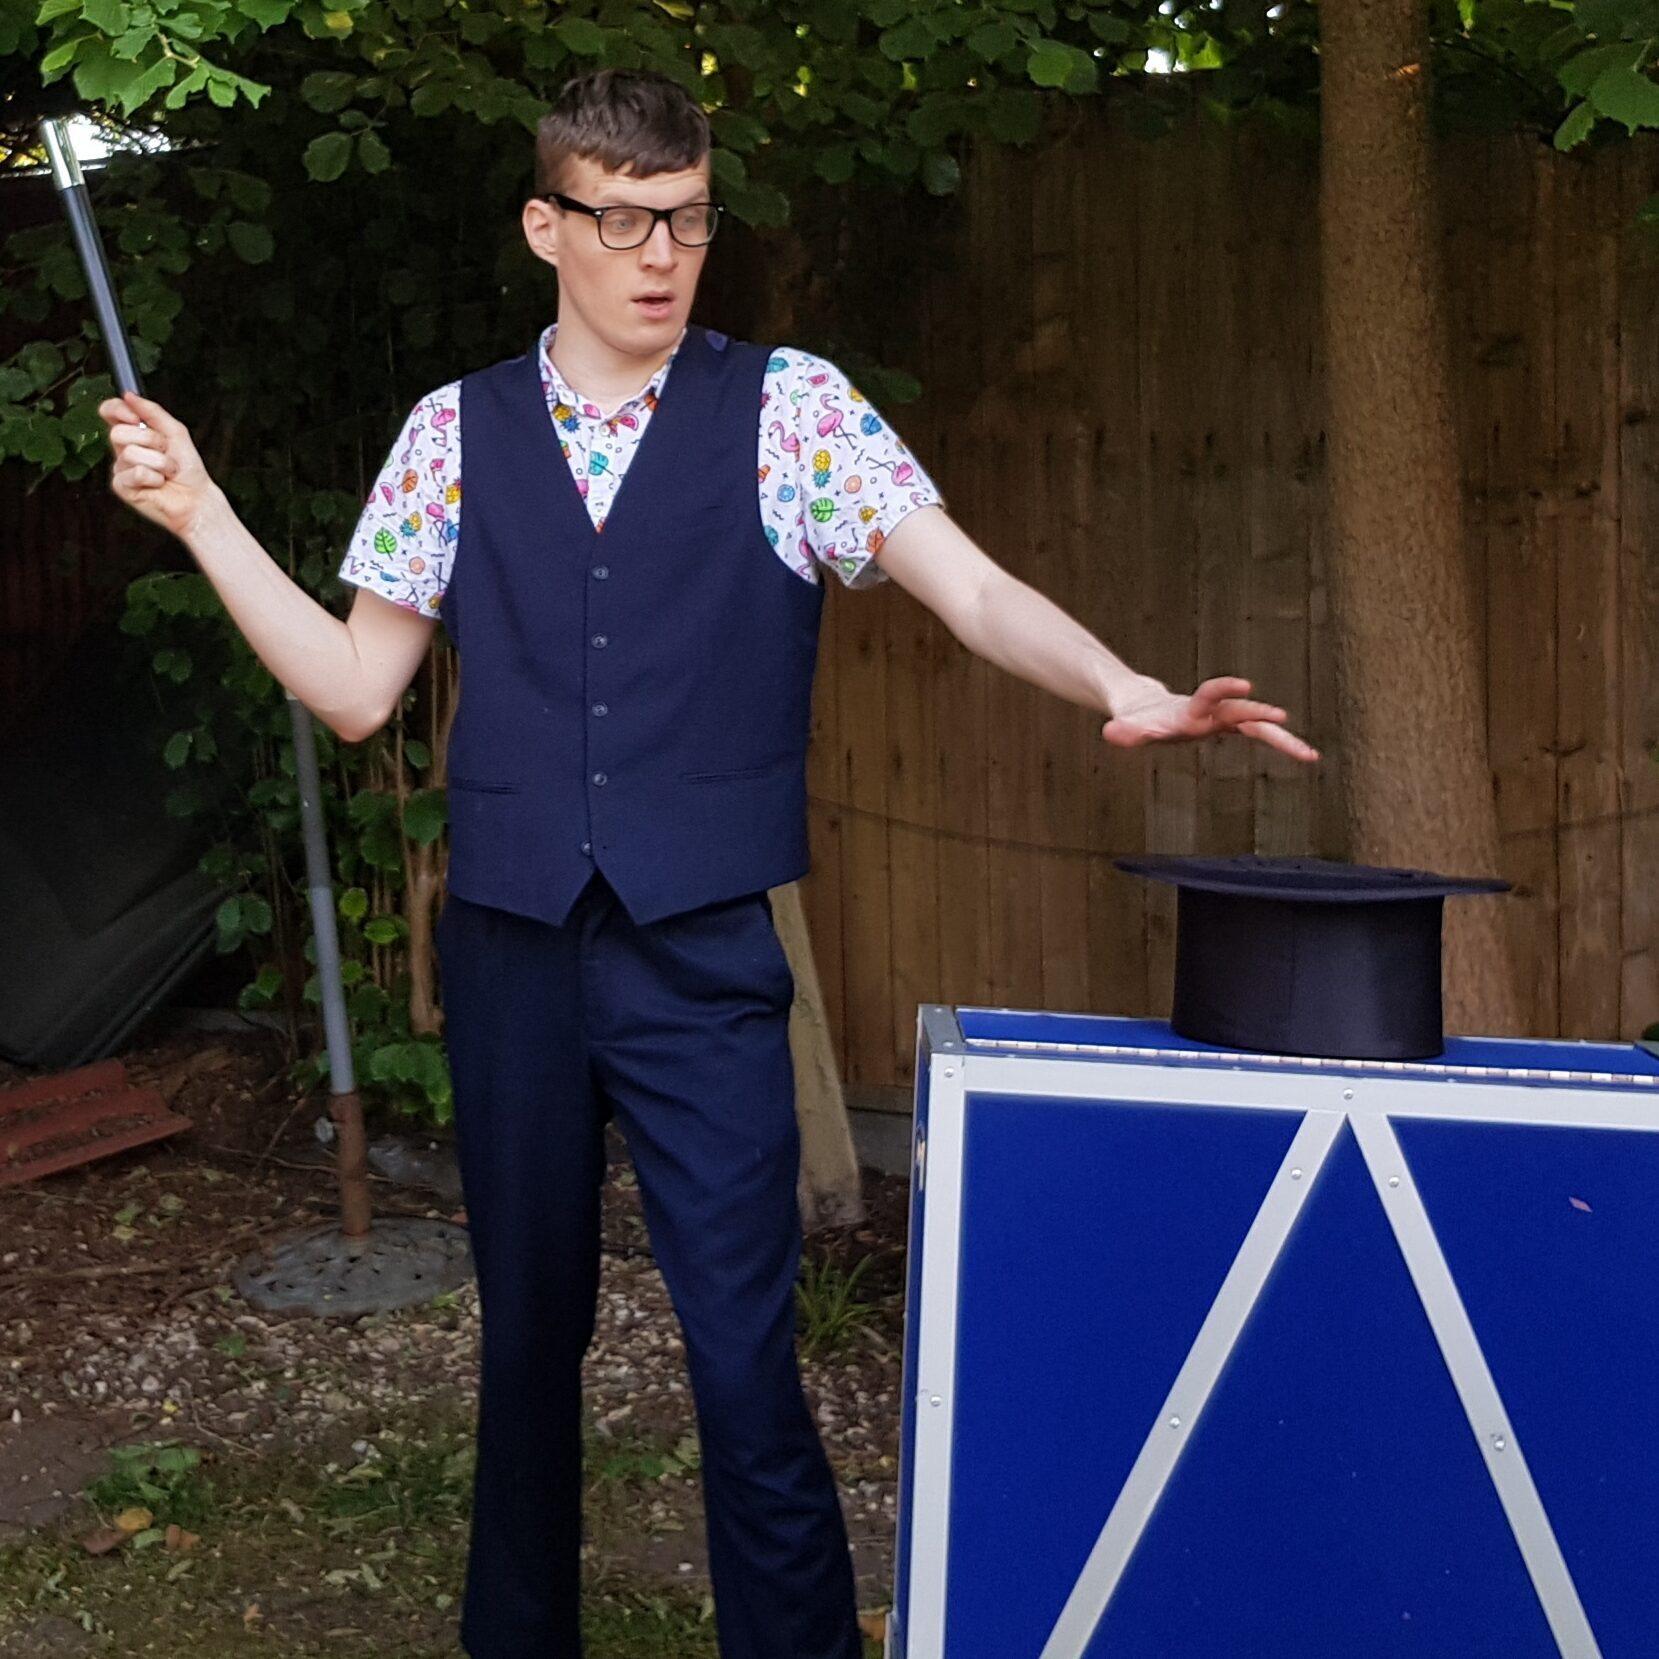 Harvo performing a magic trick with a magic wand and his magic hat